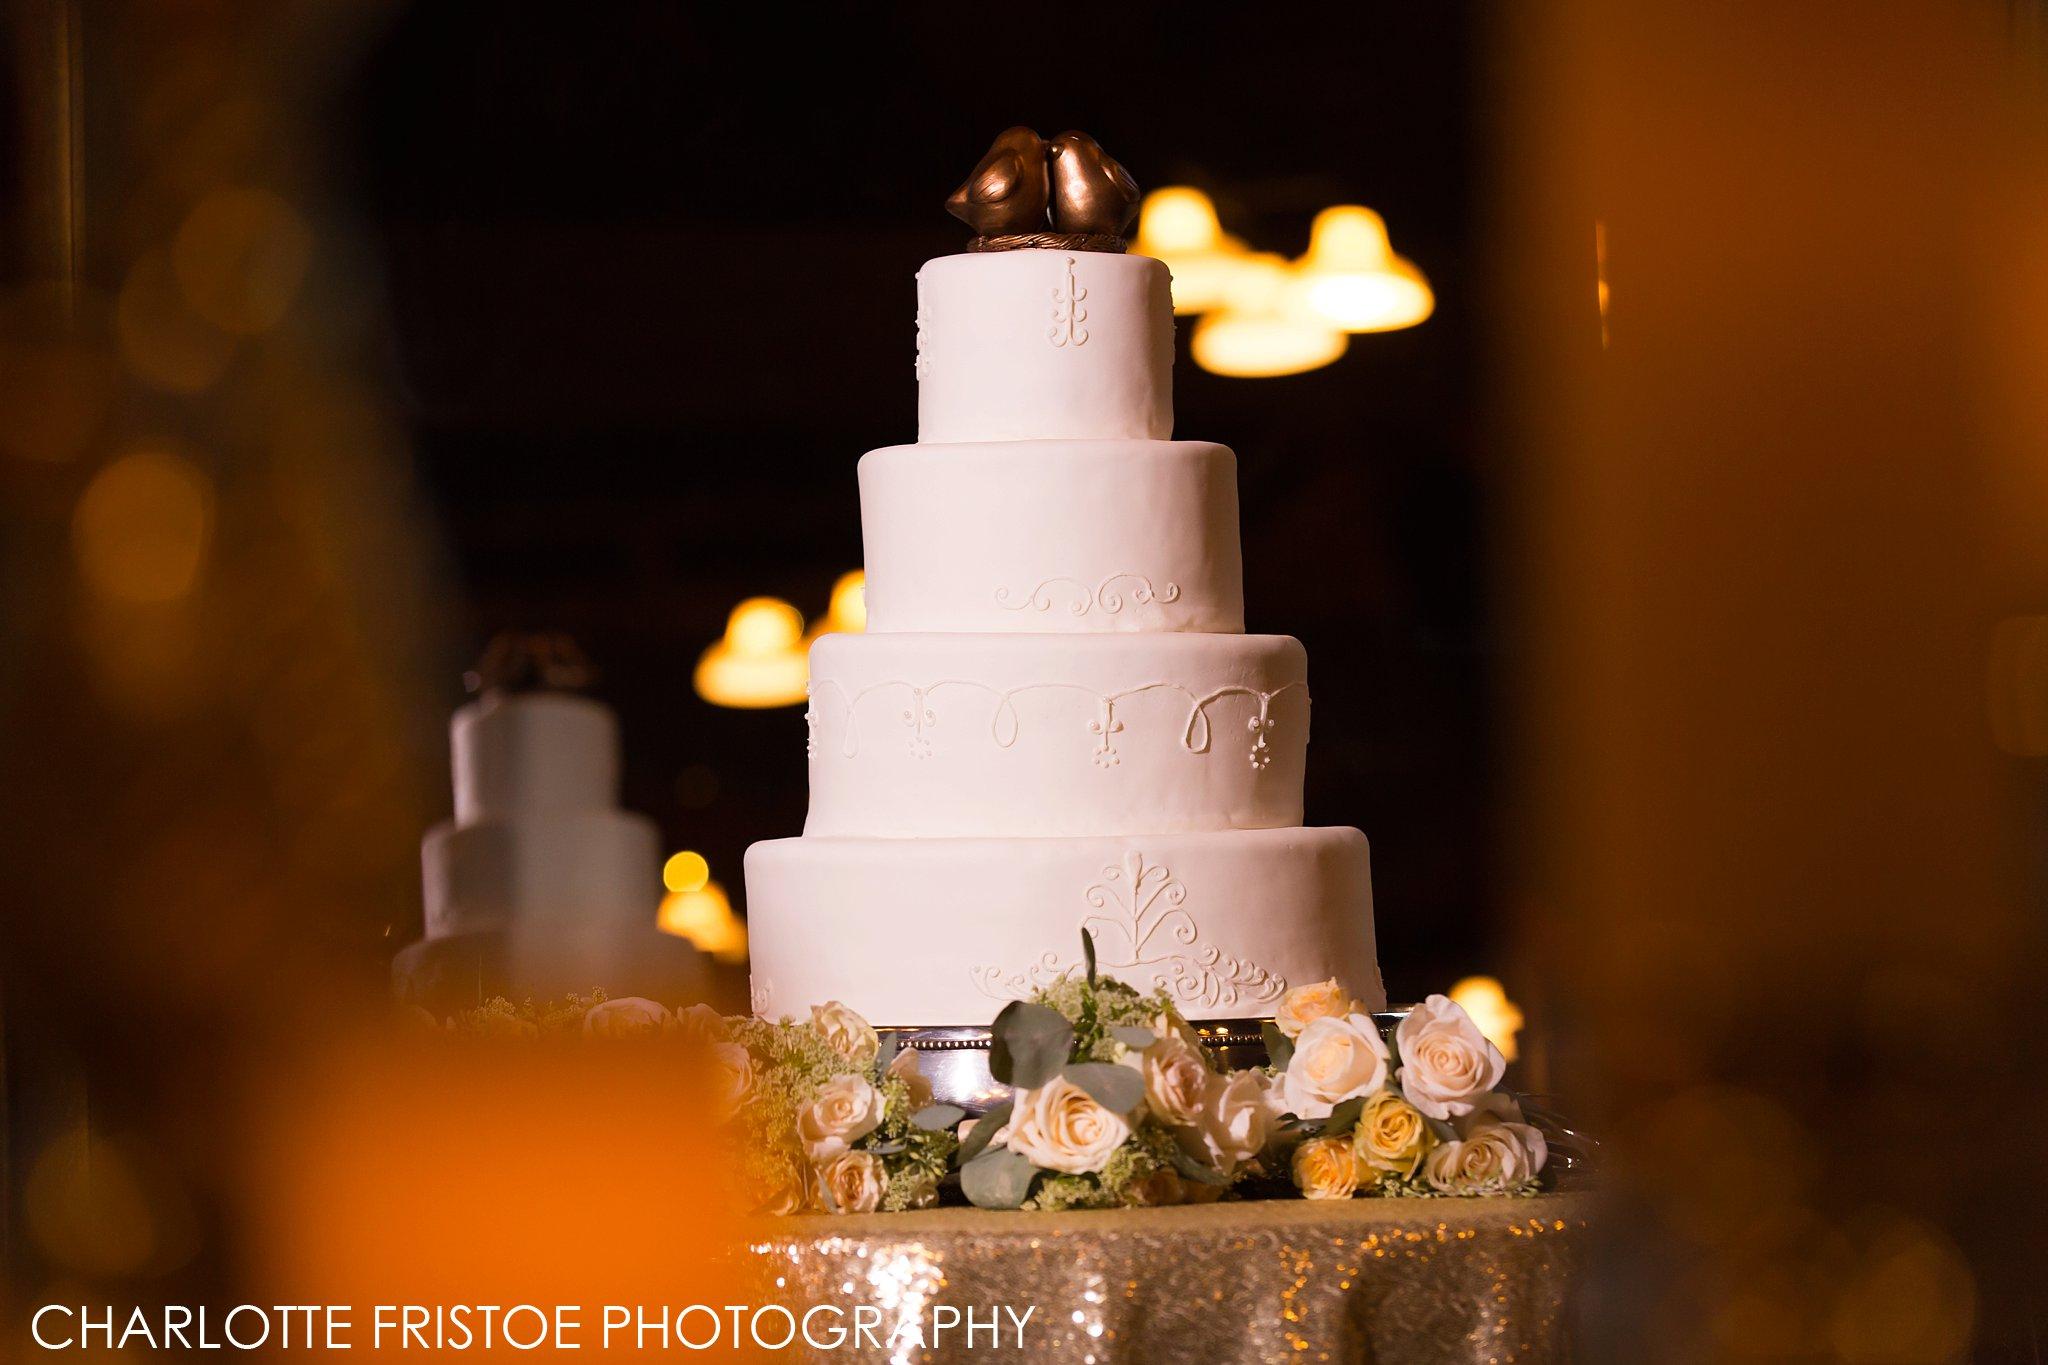 Charlotte Fristoe Photography Blog-61.jpg